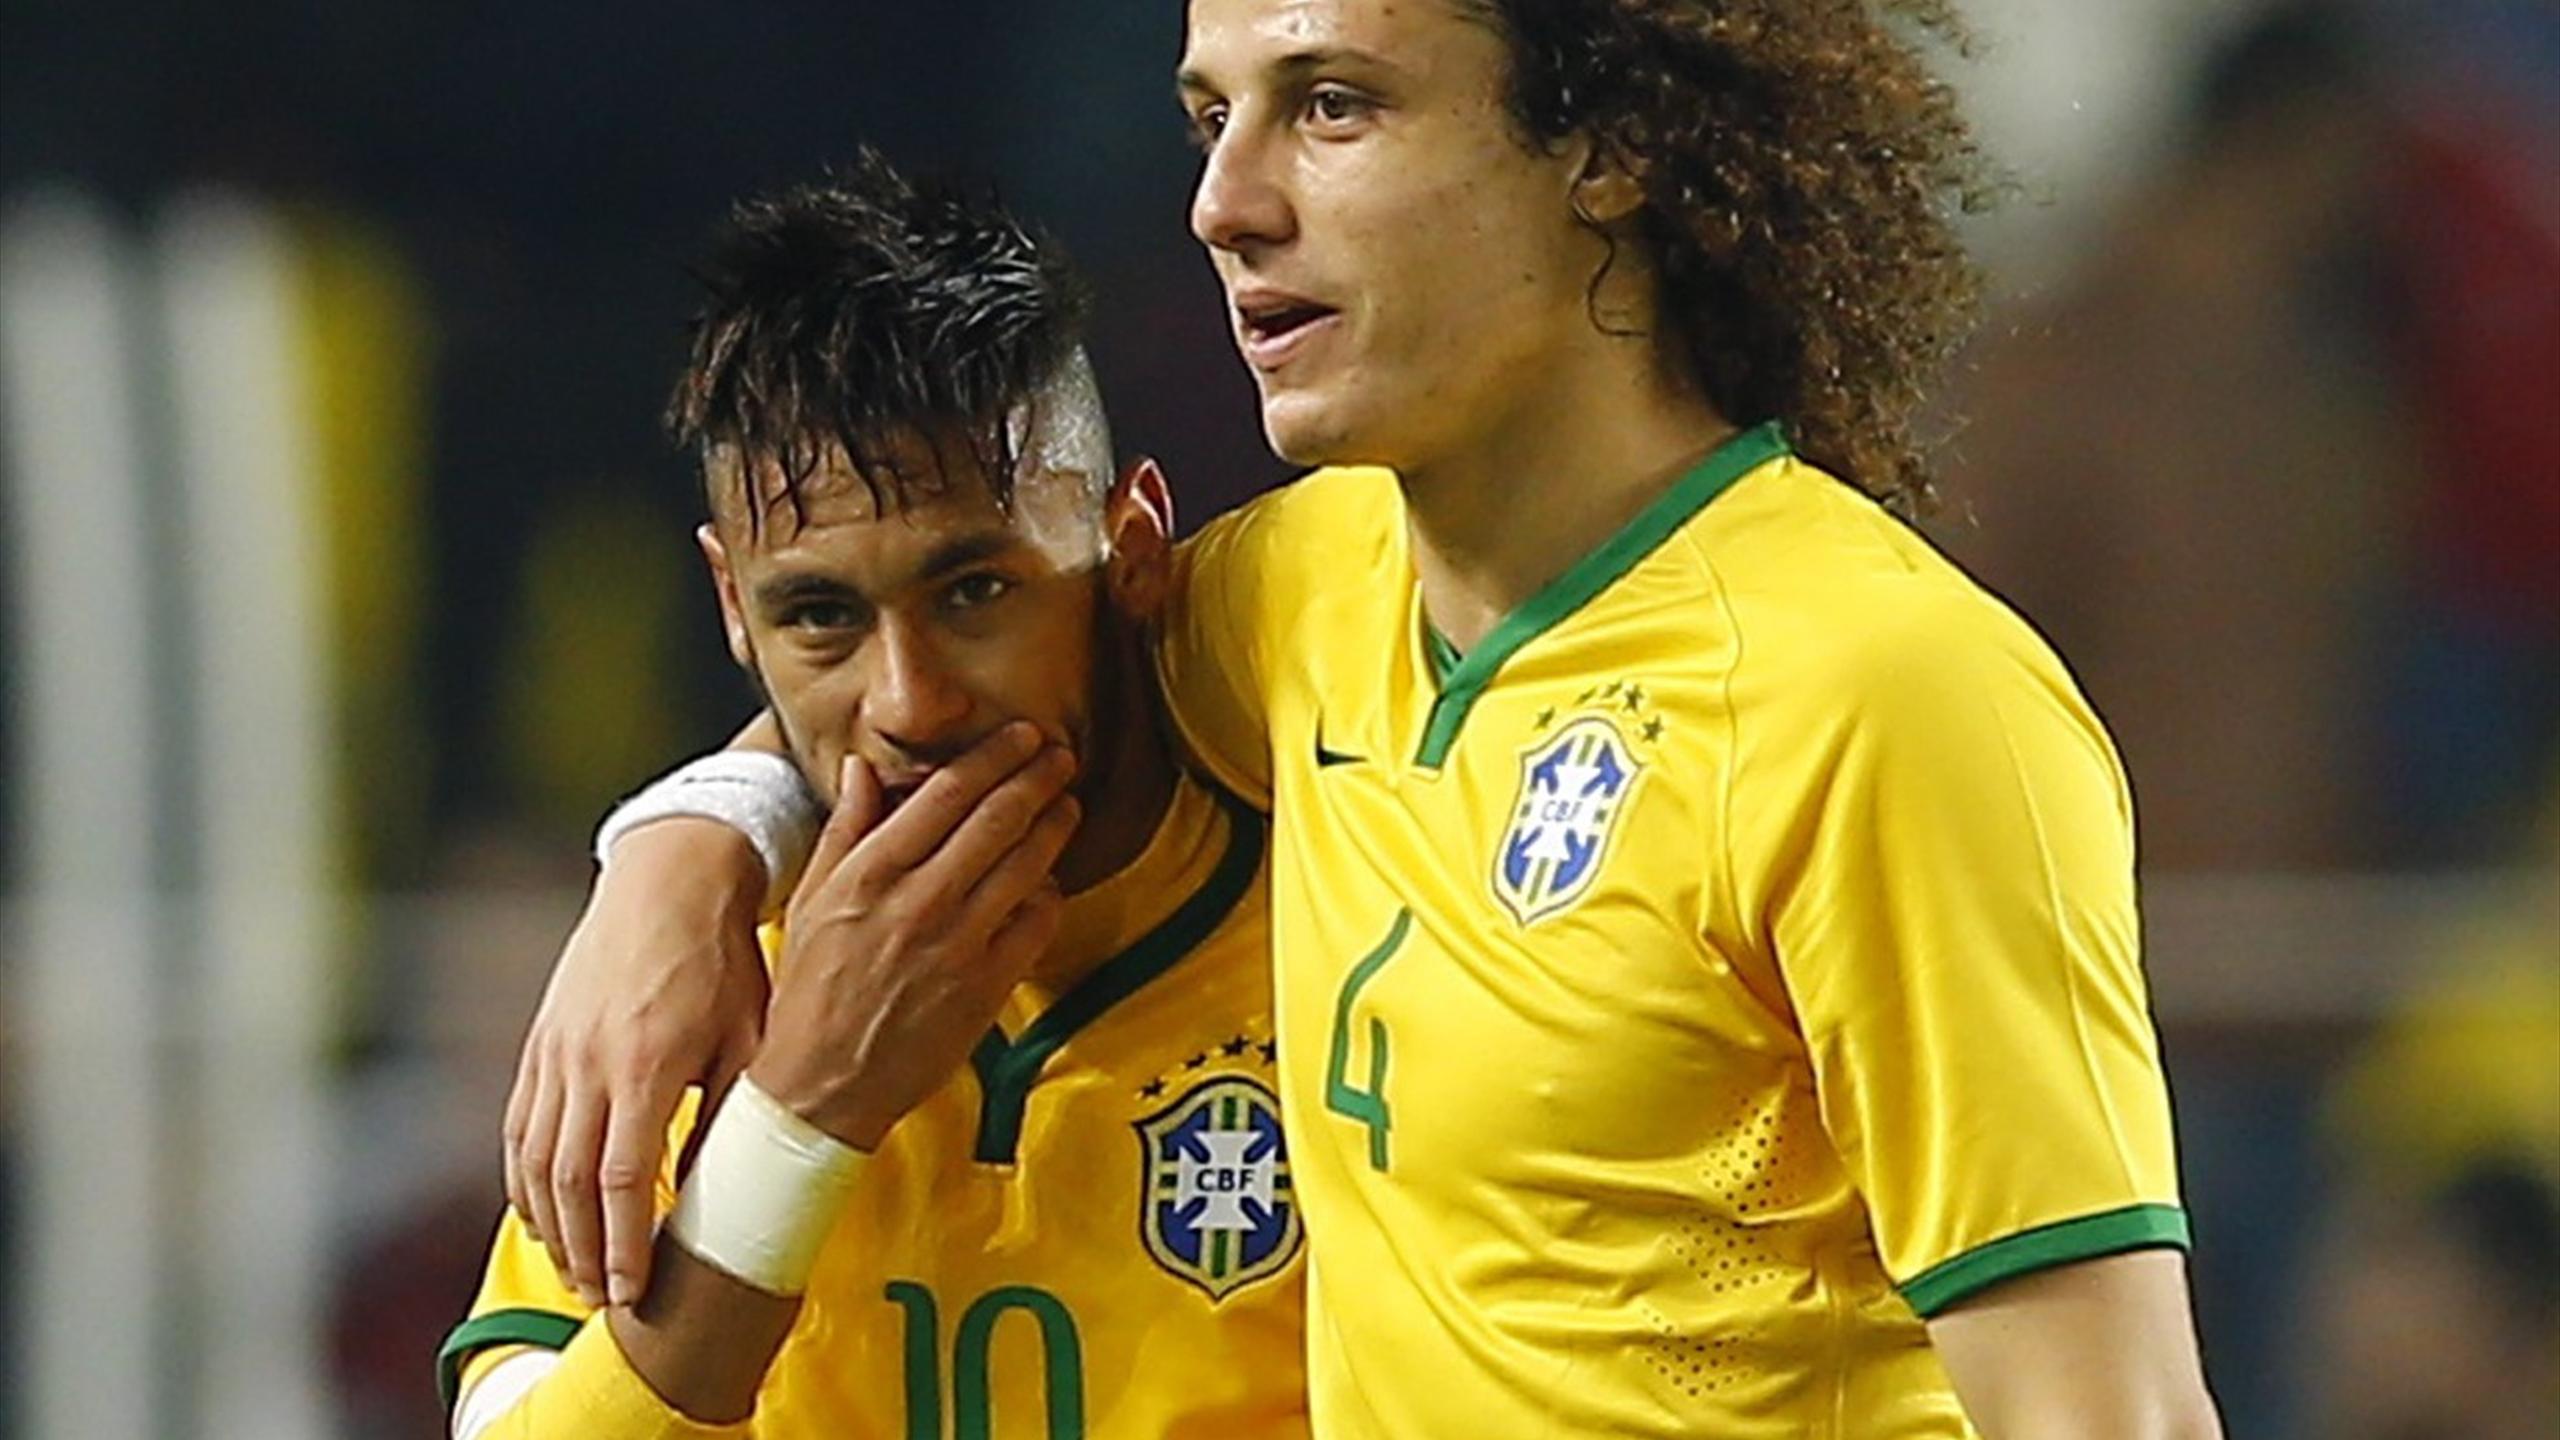 Neymar and David Luiz representing Brazil